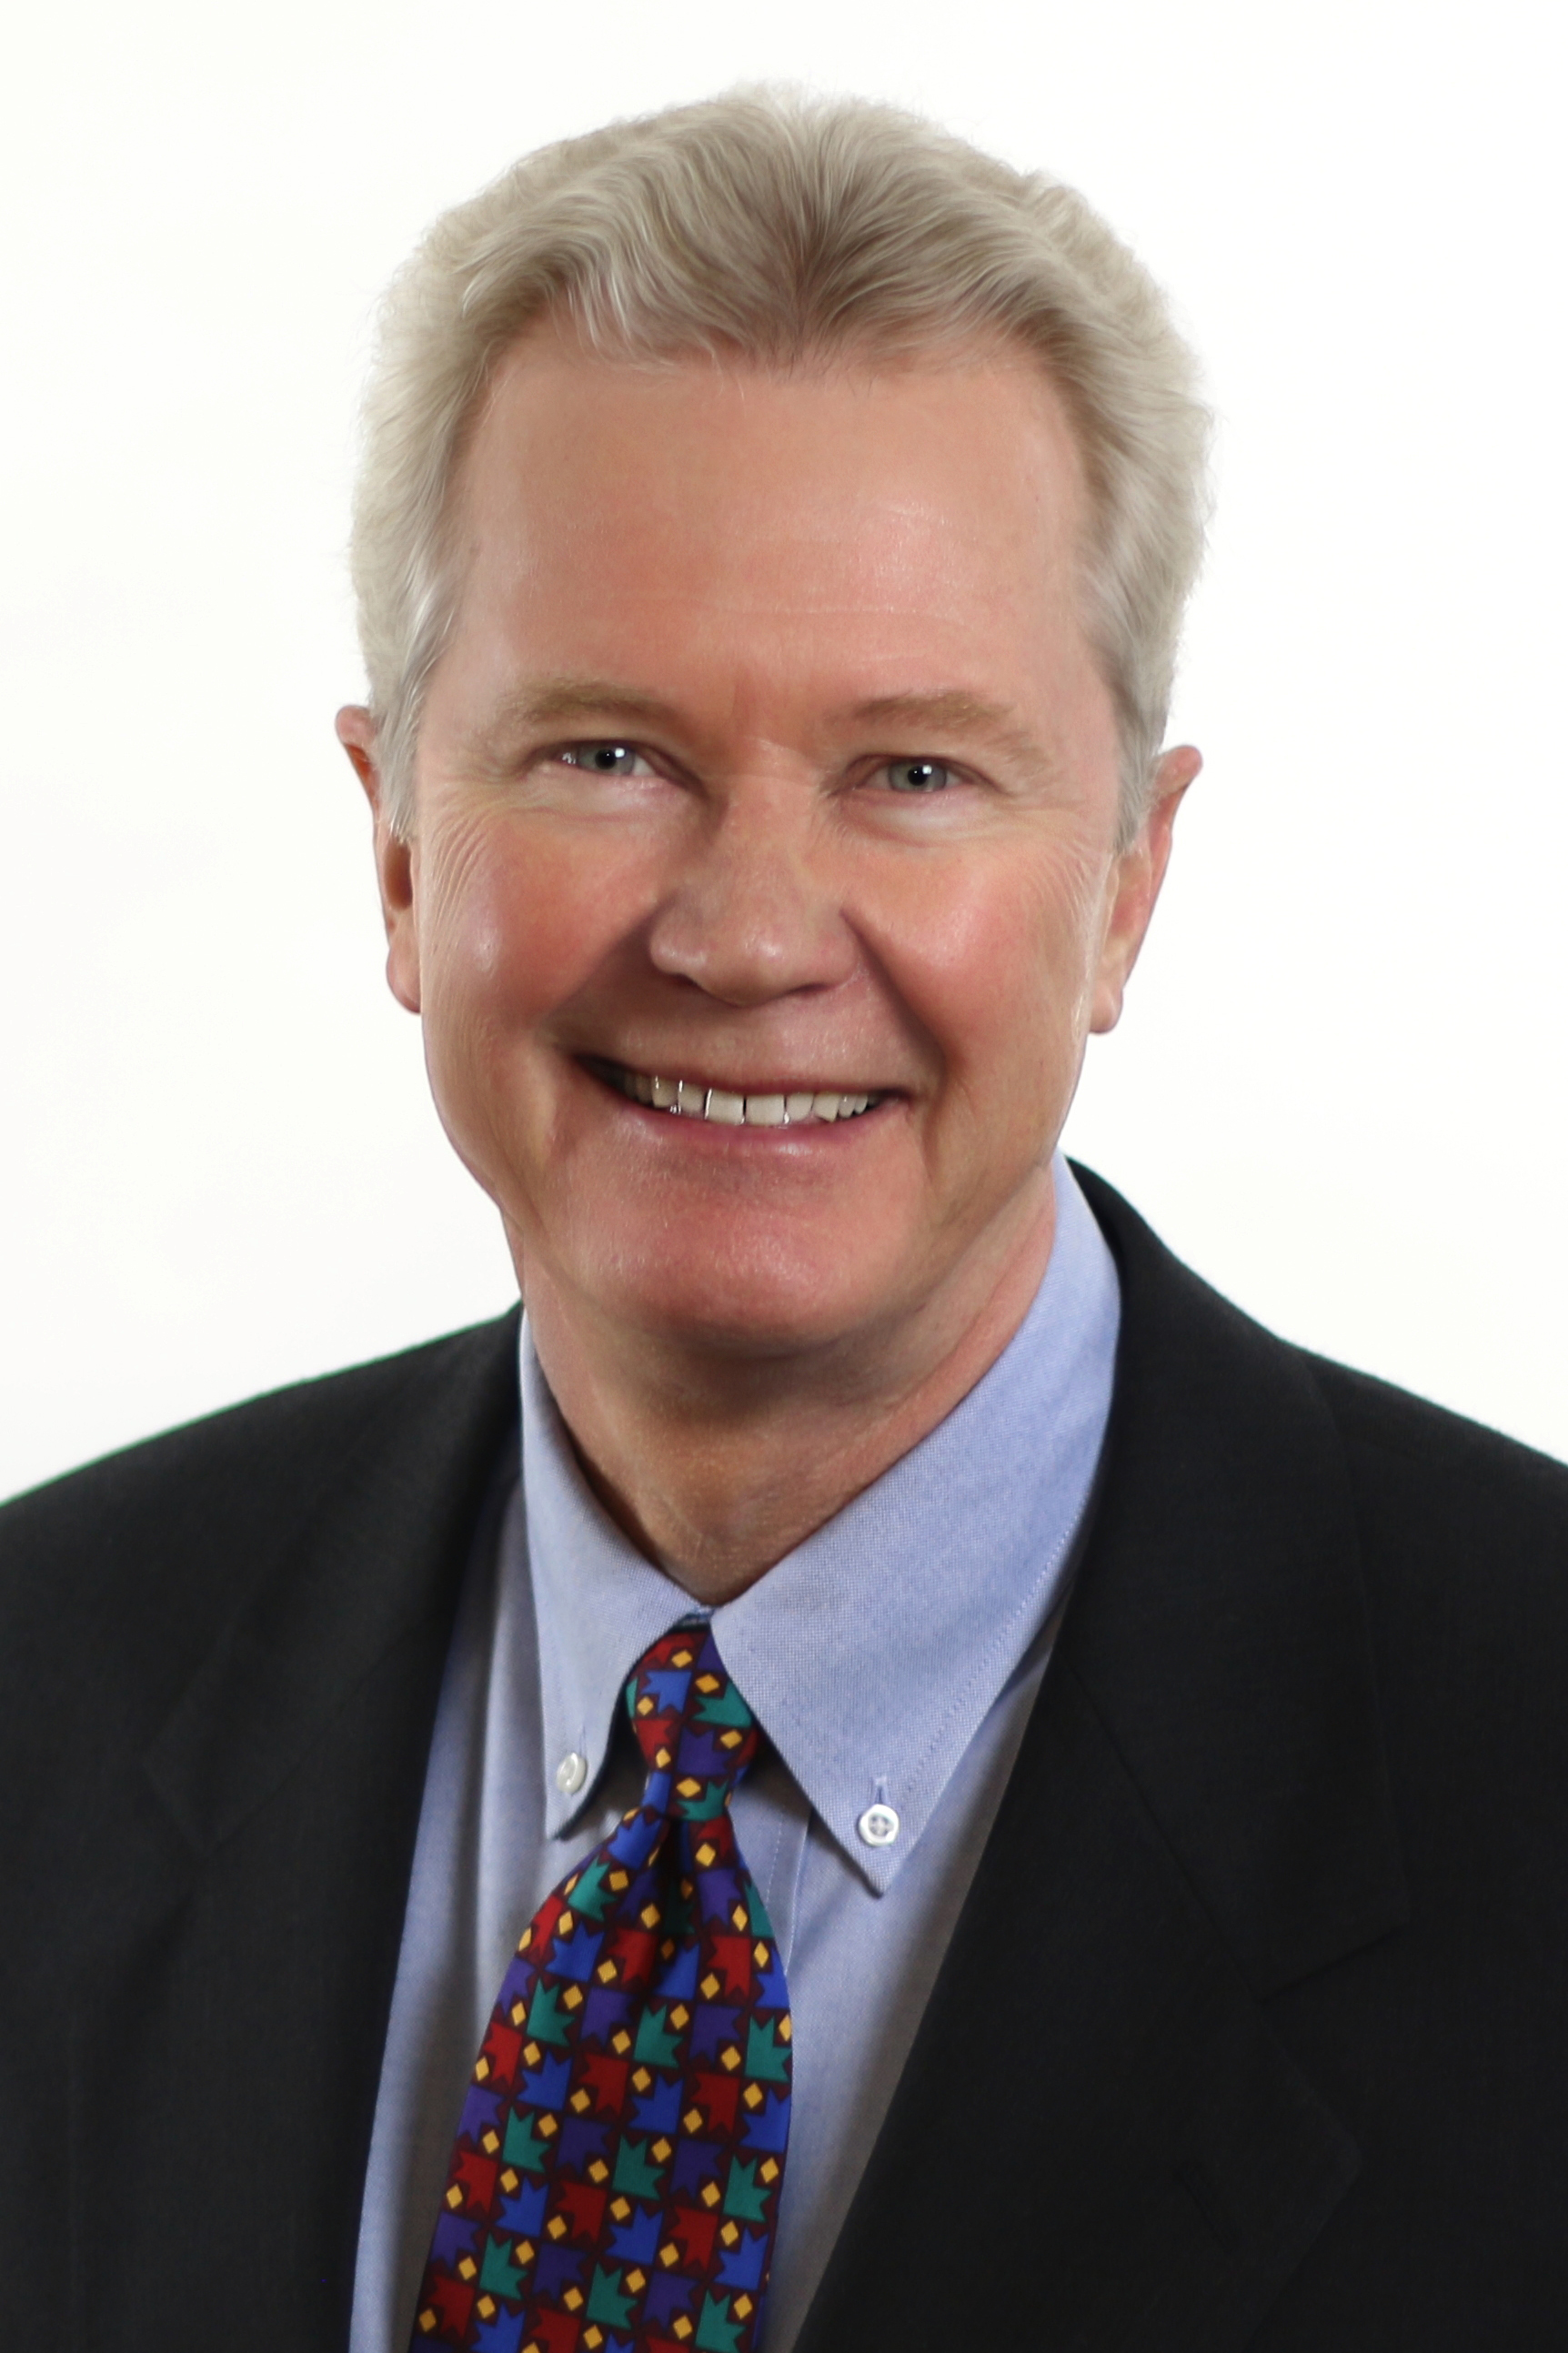 Rick Padelford